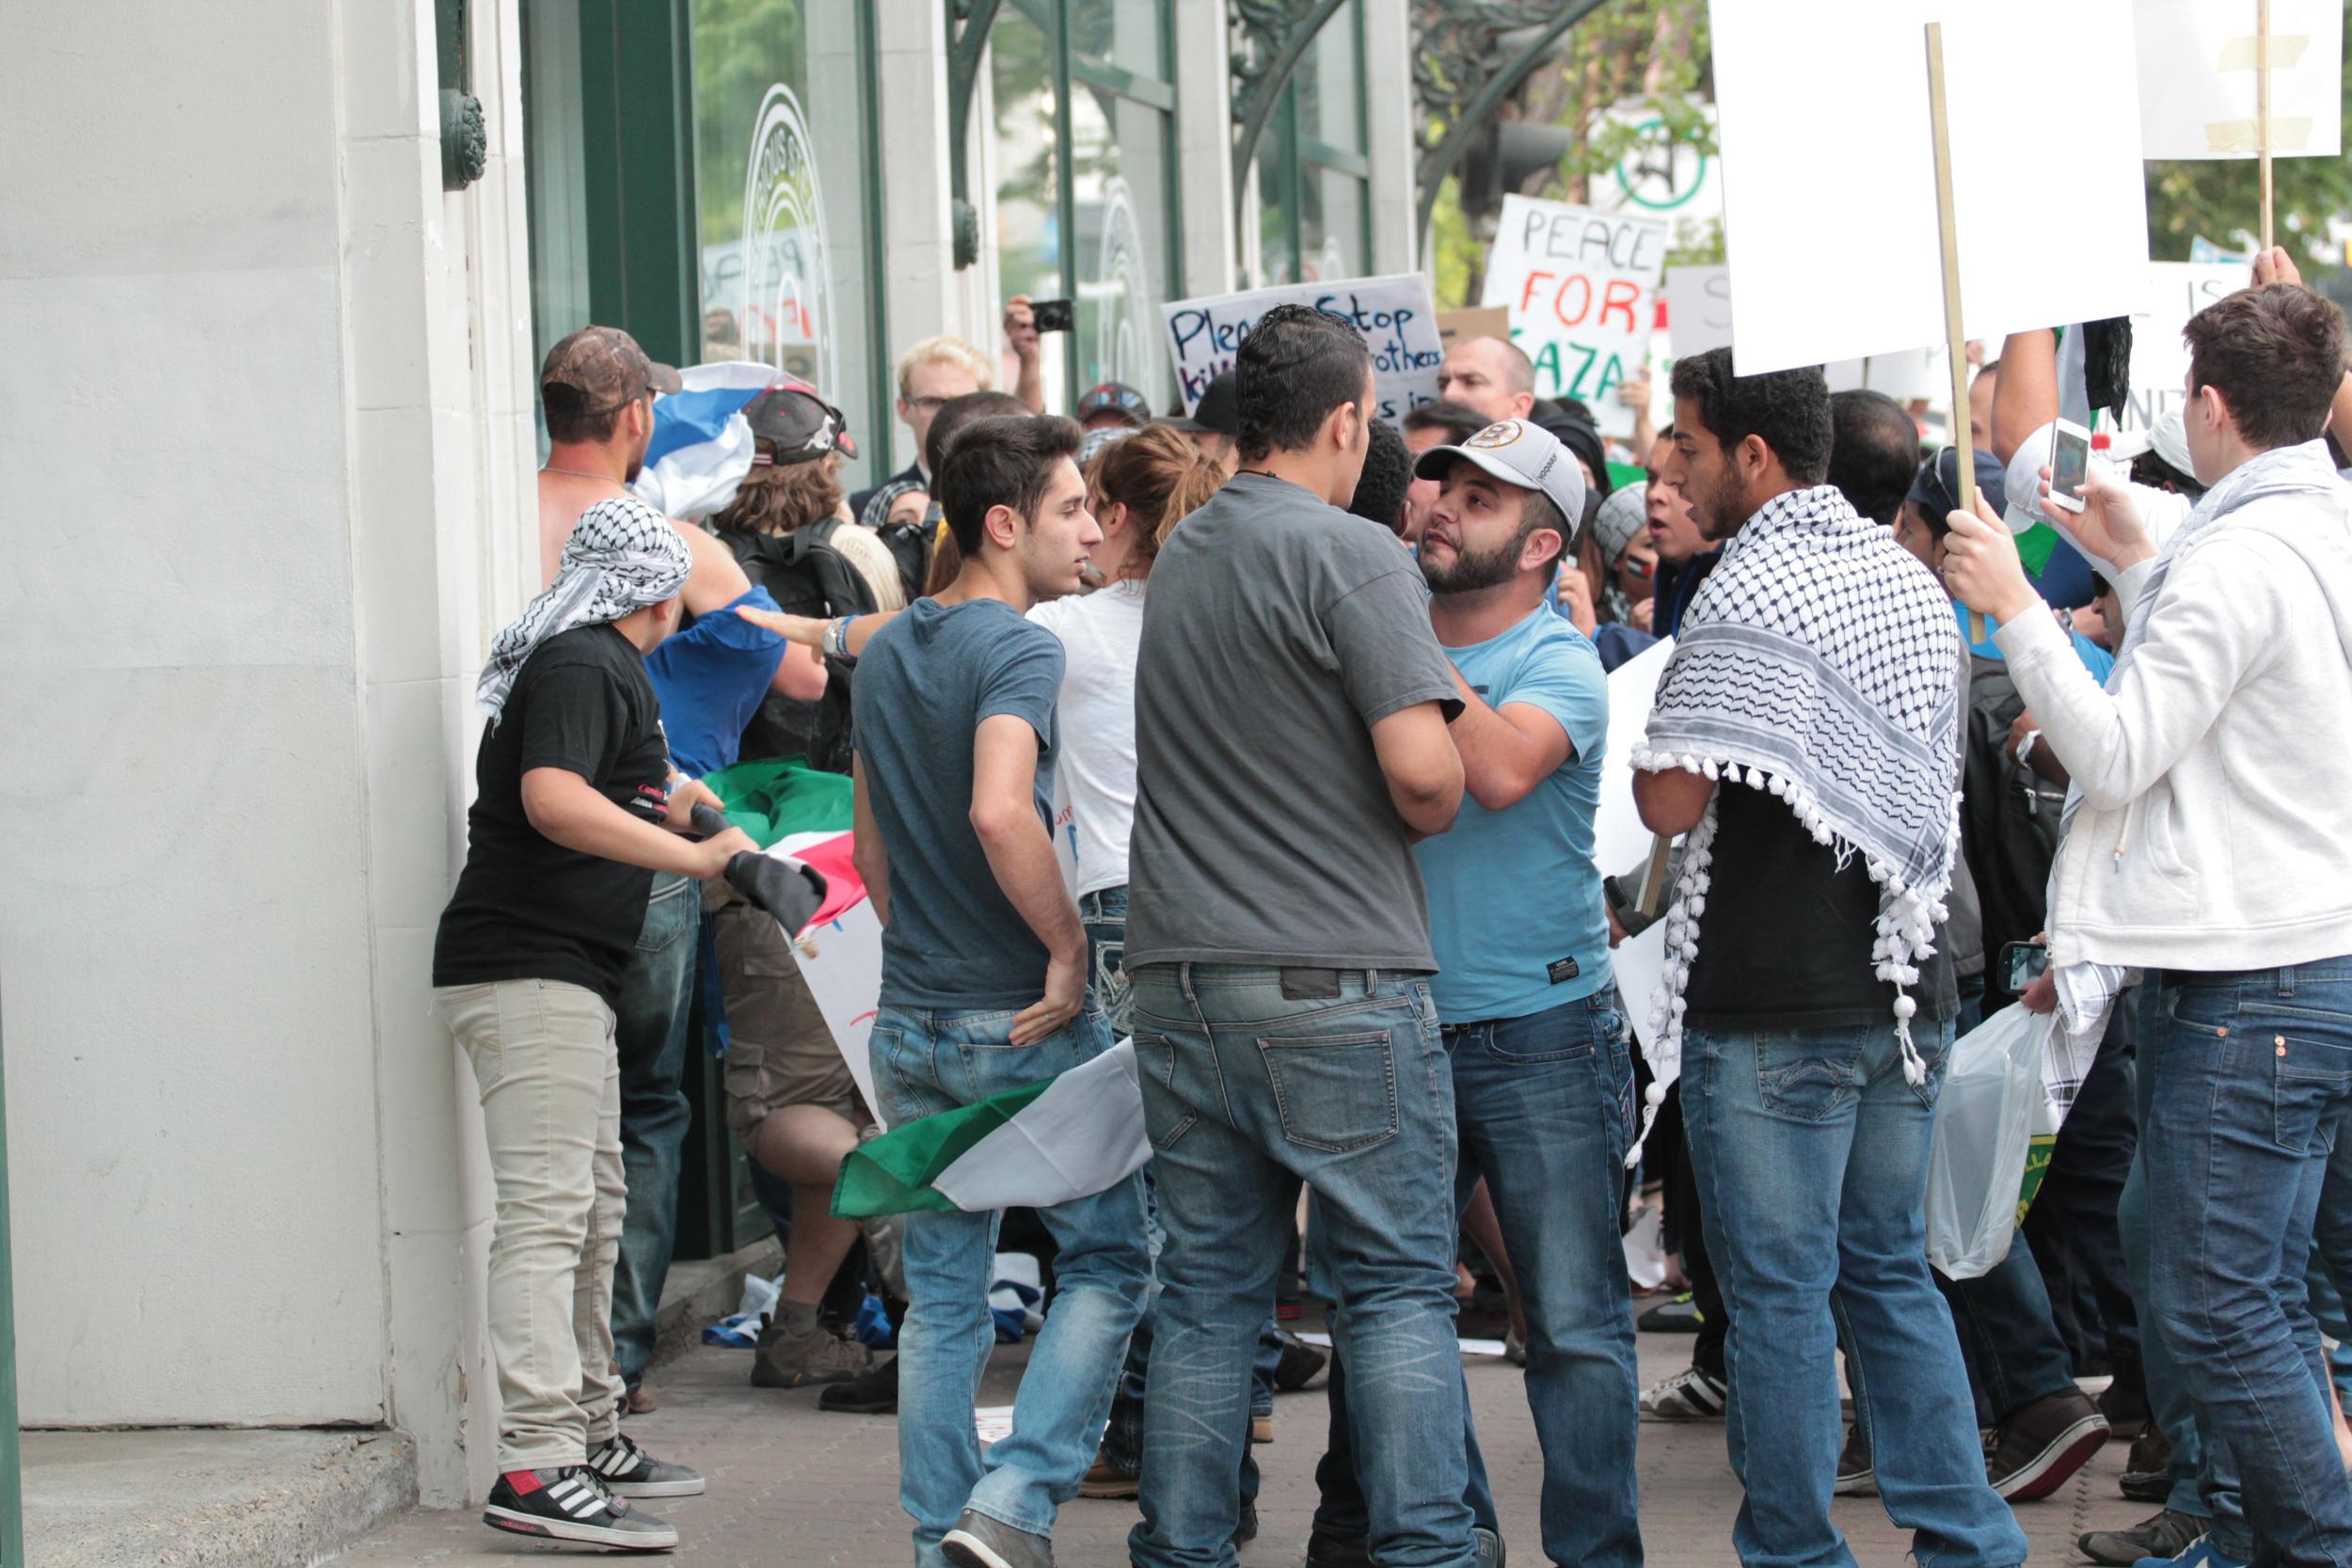 HeathCoxi-Protest- July 18 2014-0236.jpg